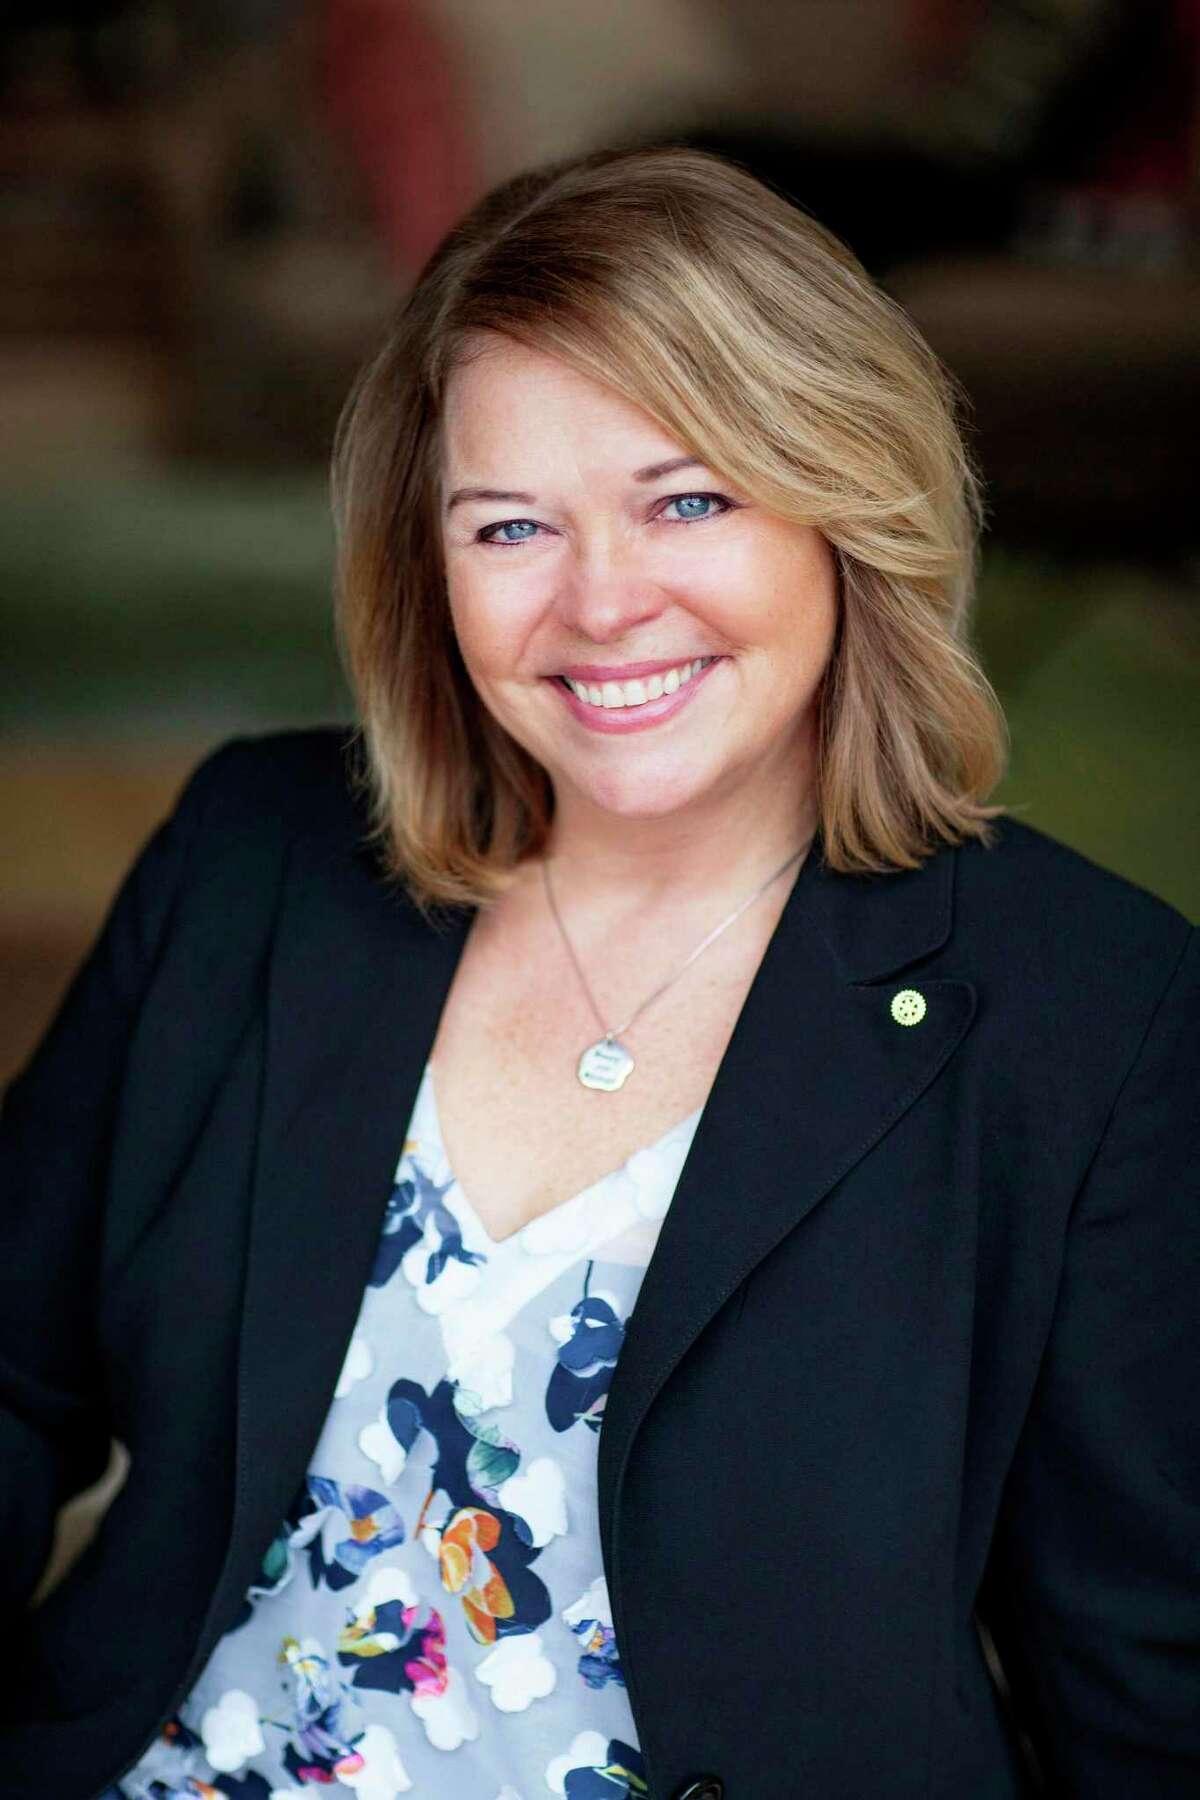 Dawn Emerick will be the new director of the San Antonio Metropolitan Health District, starting Jan. 27, 2020.